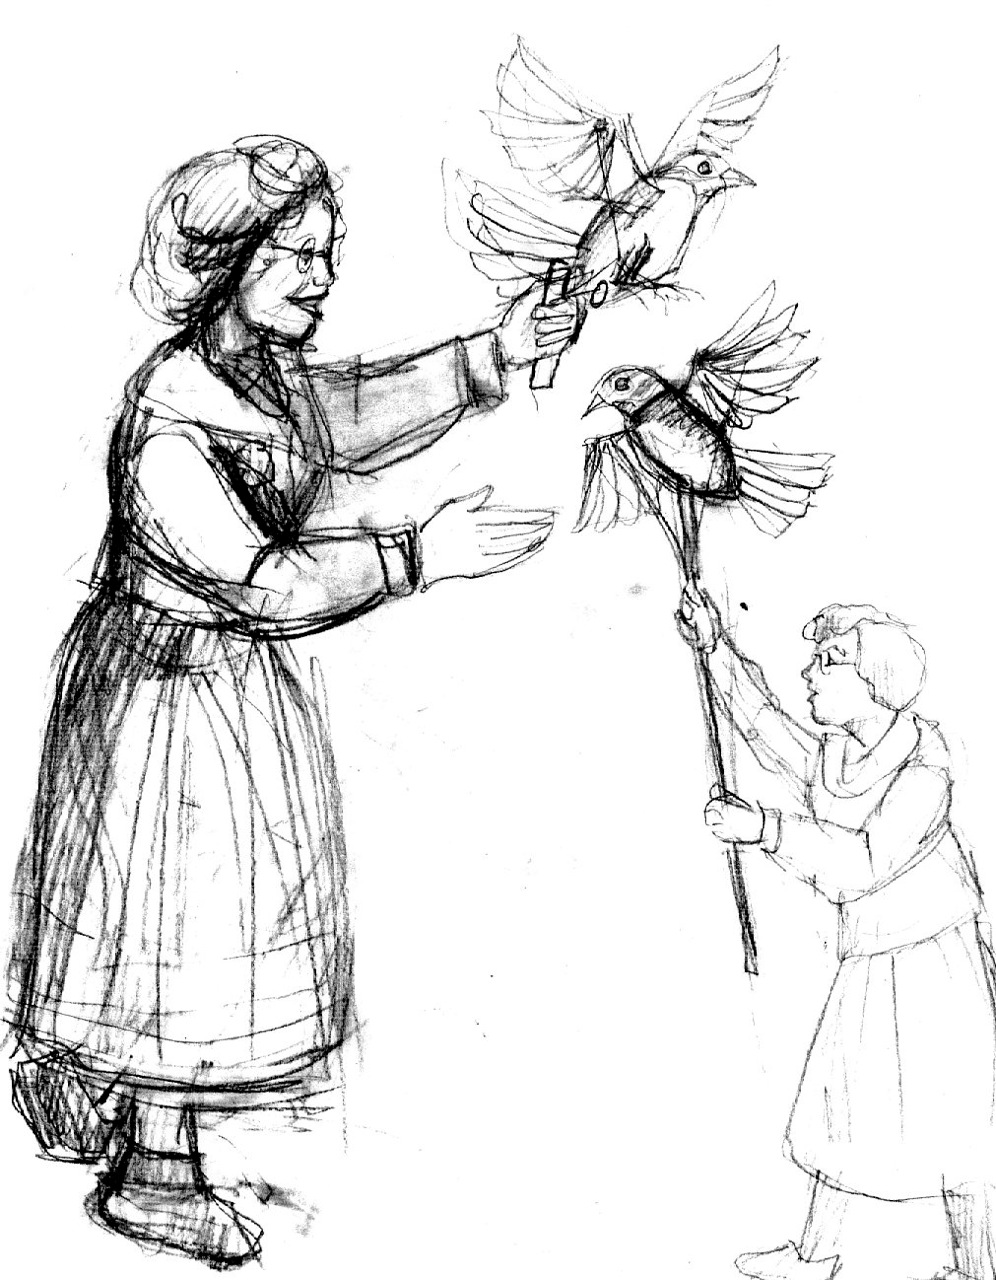 Sparrow puppet sketch by David Fichter.